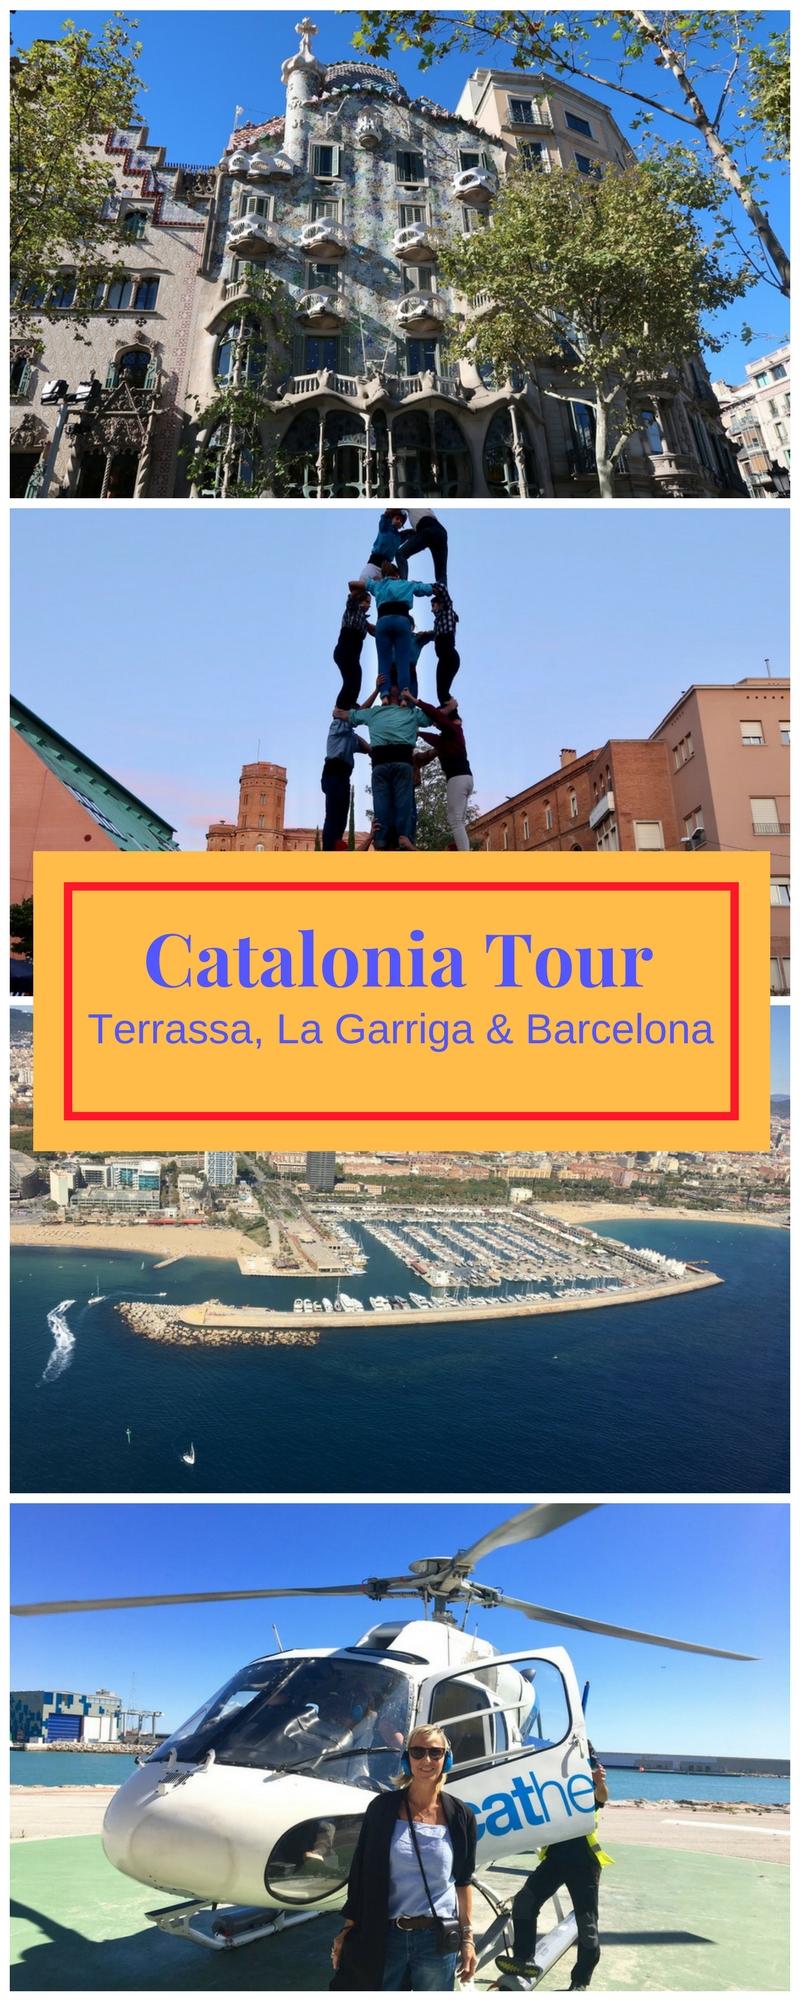 Catalonia Spain, Terrassa Catalonia Spain, La Garriga Catalonia Spain, Barcelona, Barcelona Catalonia, Short Break Catalonia, Road Trip Catalonia